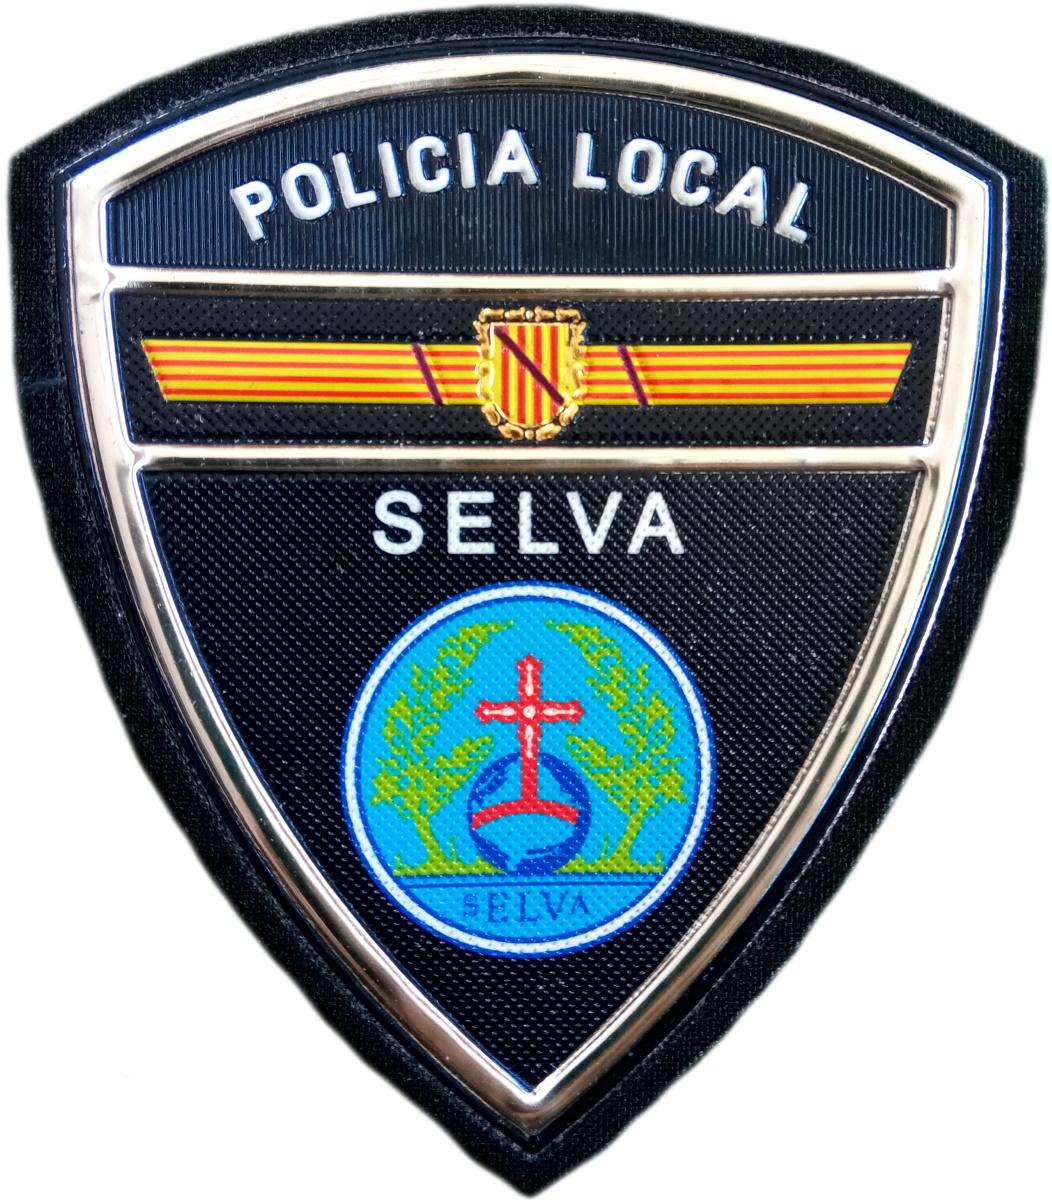 Policía Local Selva parche insignia emblema distintivo